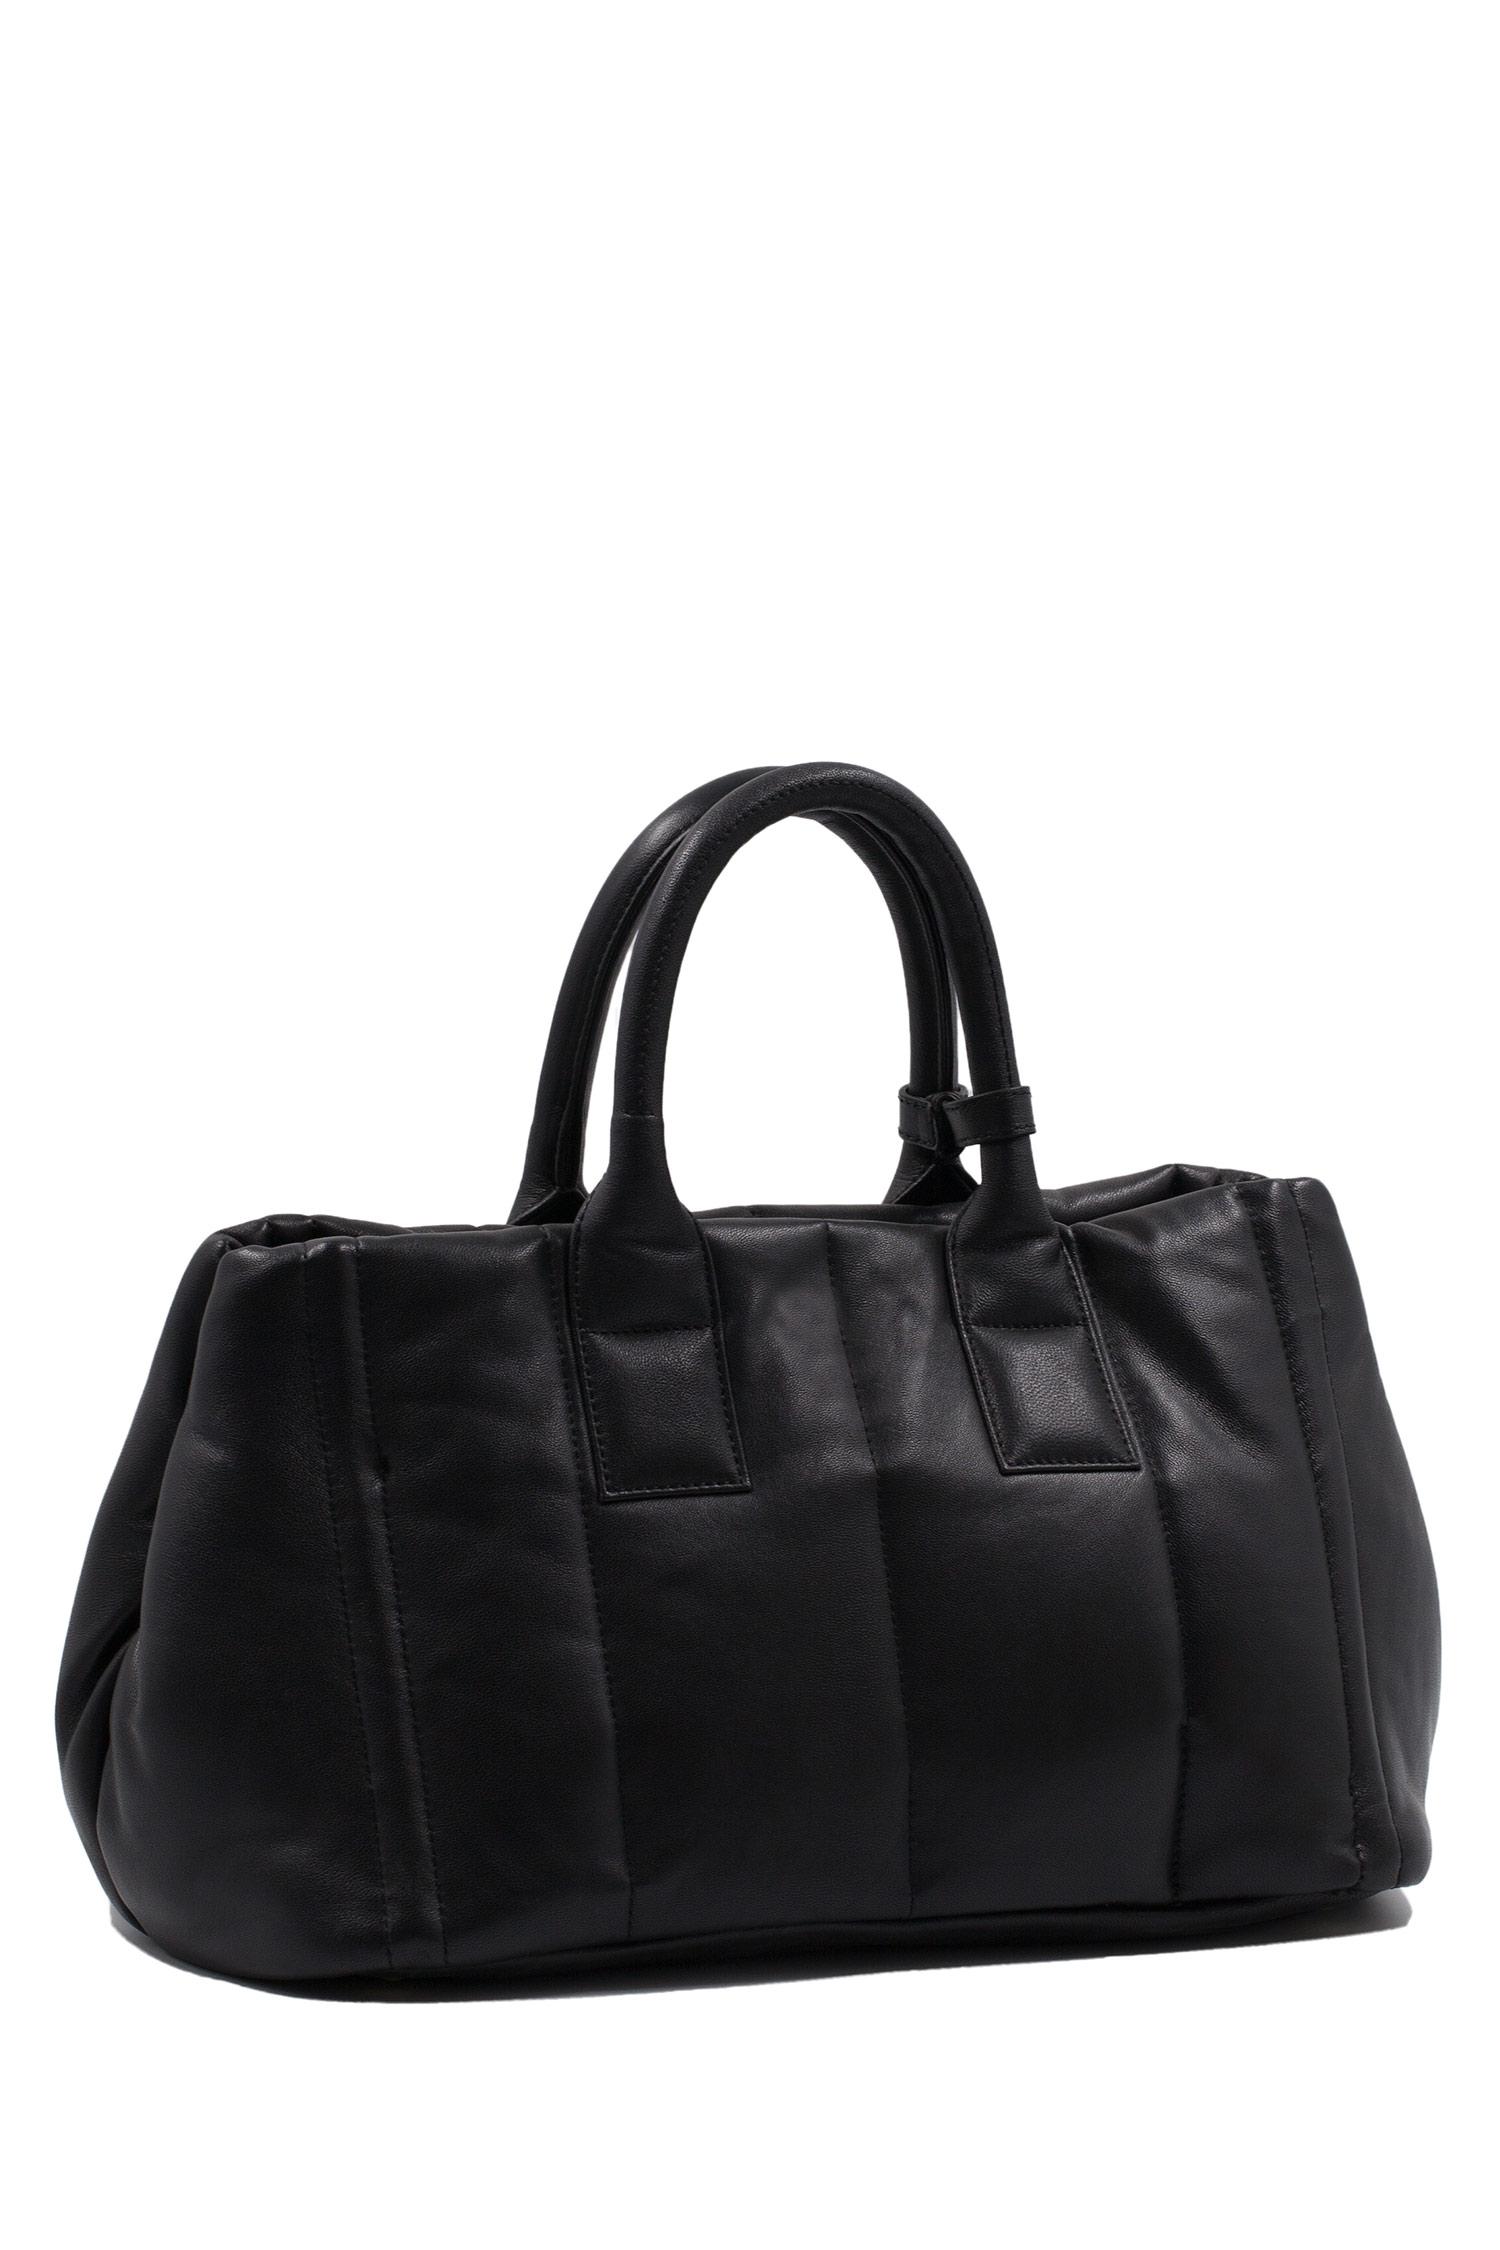 Genuine Leather 2017 High Quality Luxury Woman Handbag